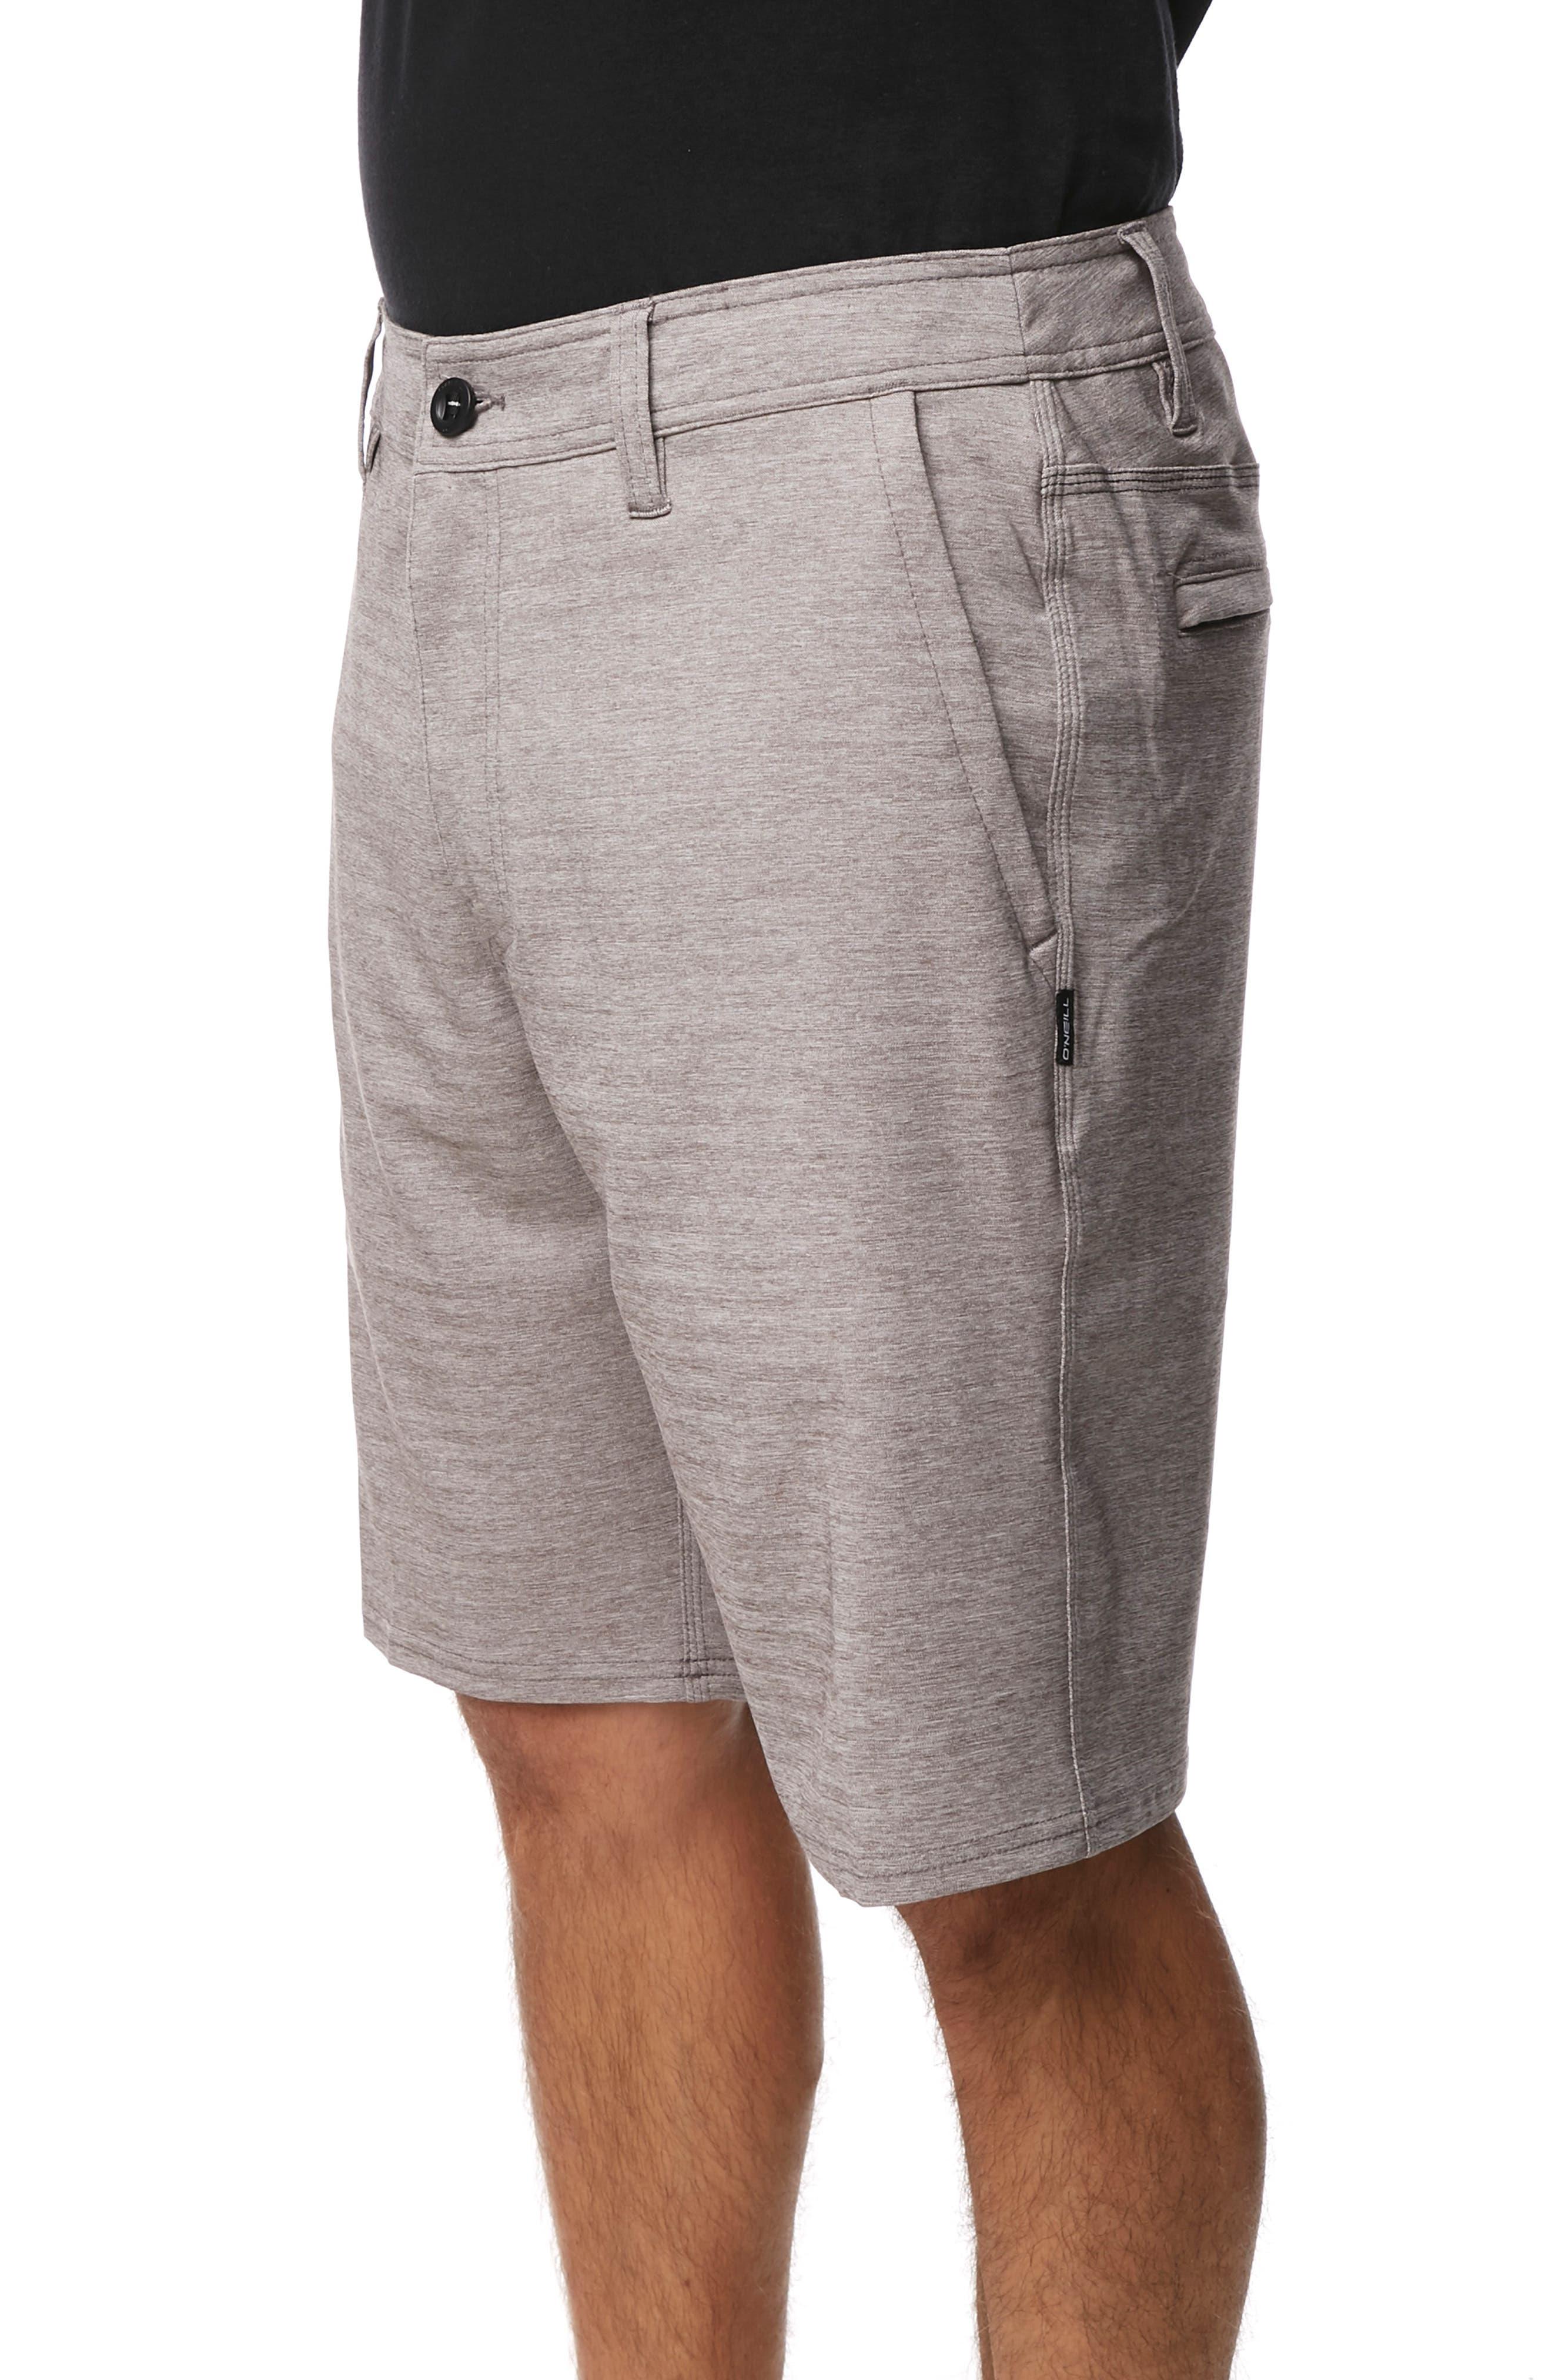 O'NEILL, Locked Herringbone Hybrid Shorts, Alternate thumbnail 3, color, GUN METAL